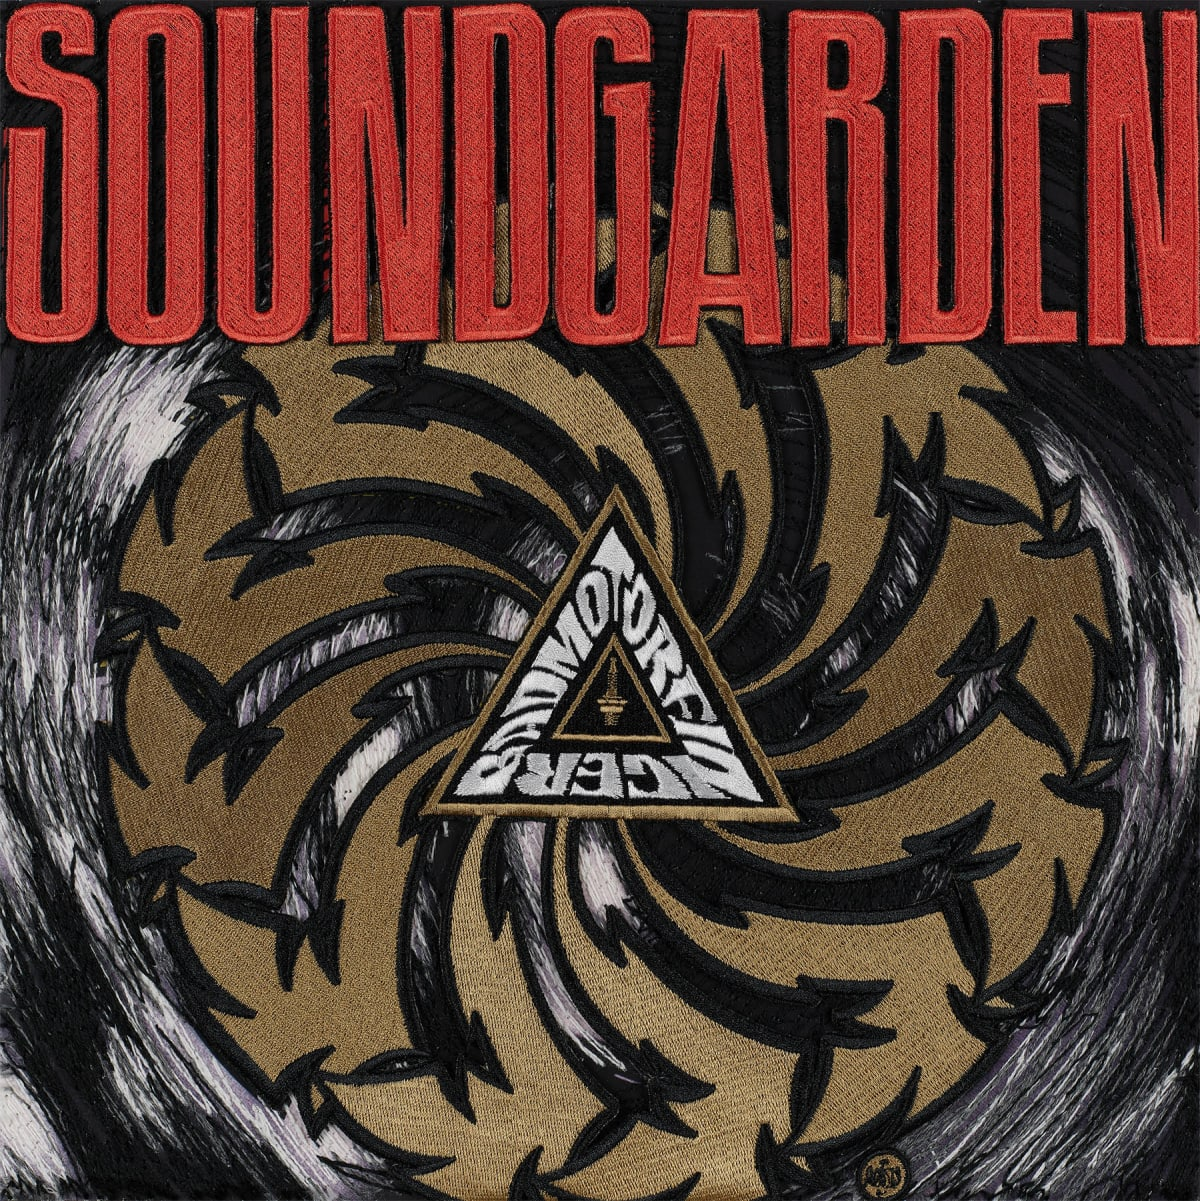 Stephen Wilson, Badmotorfinger, Soundgarden, 2019